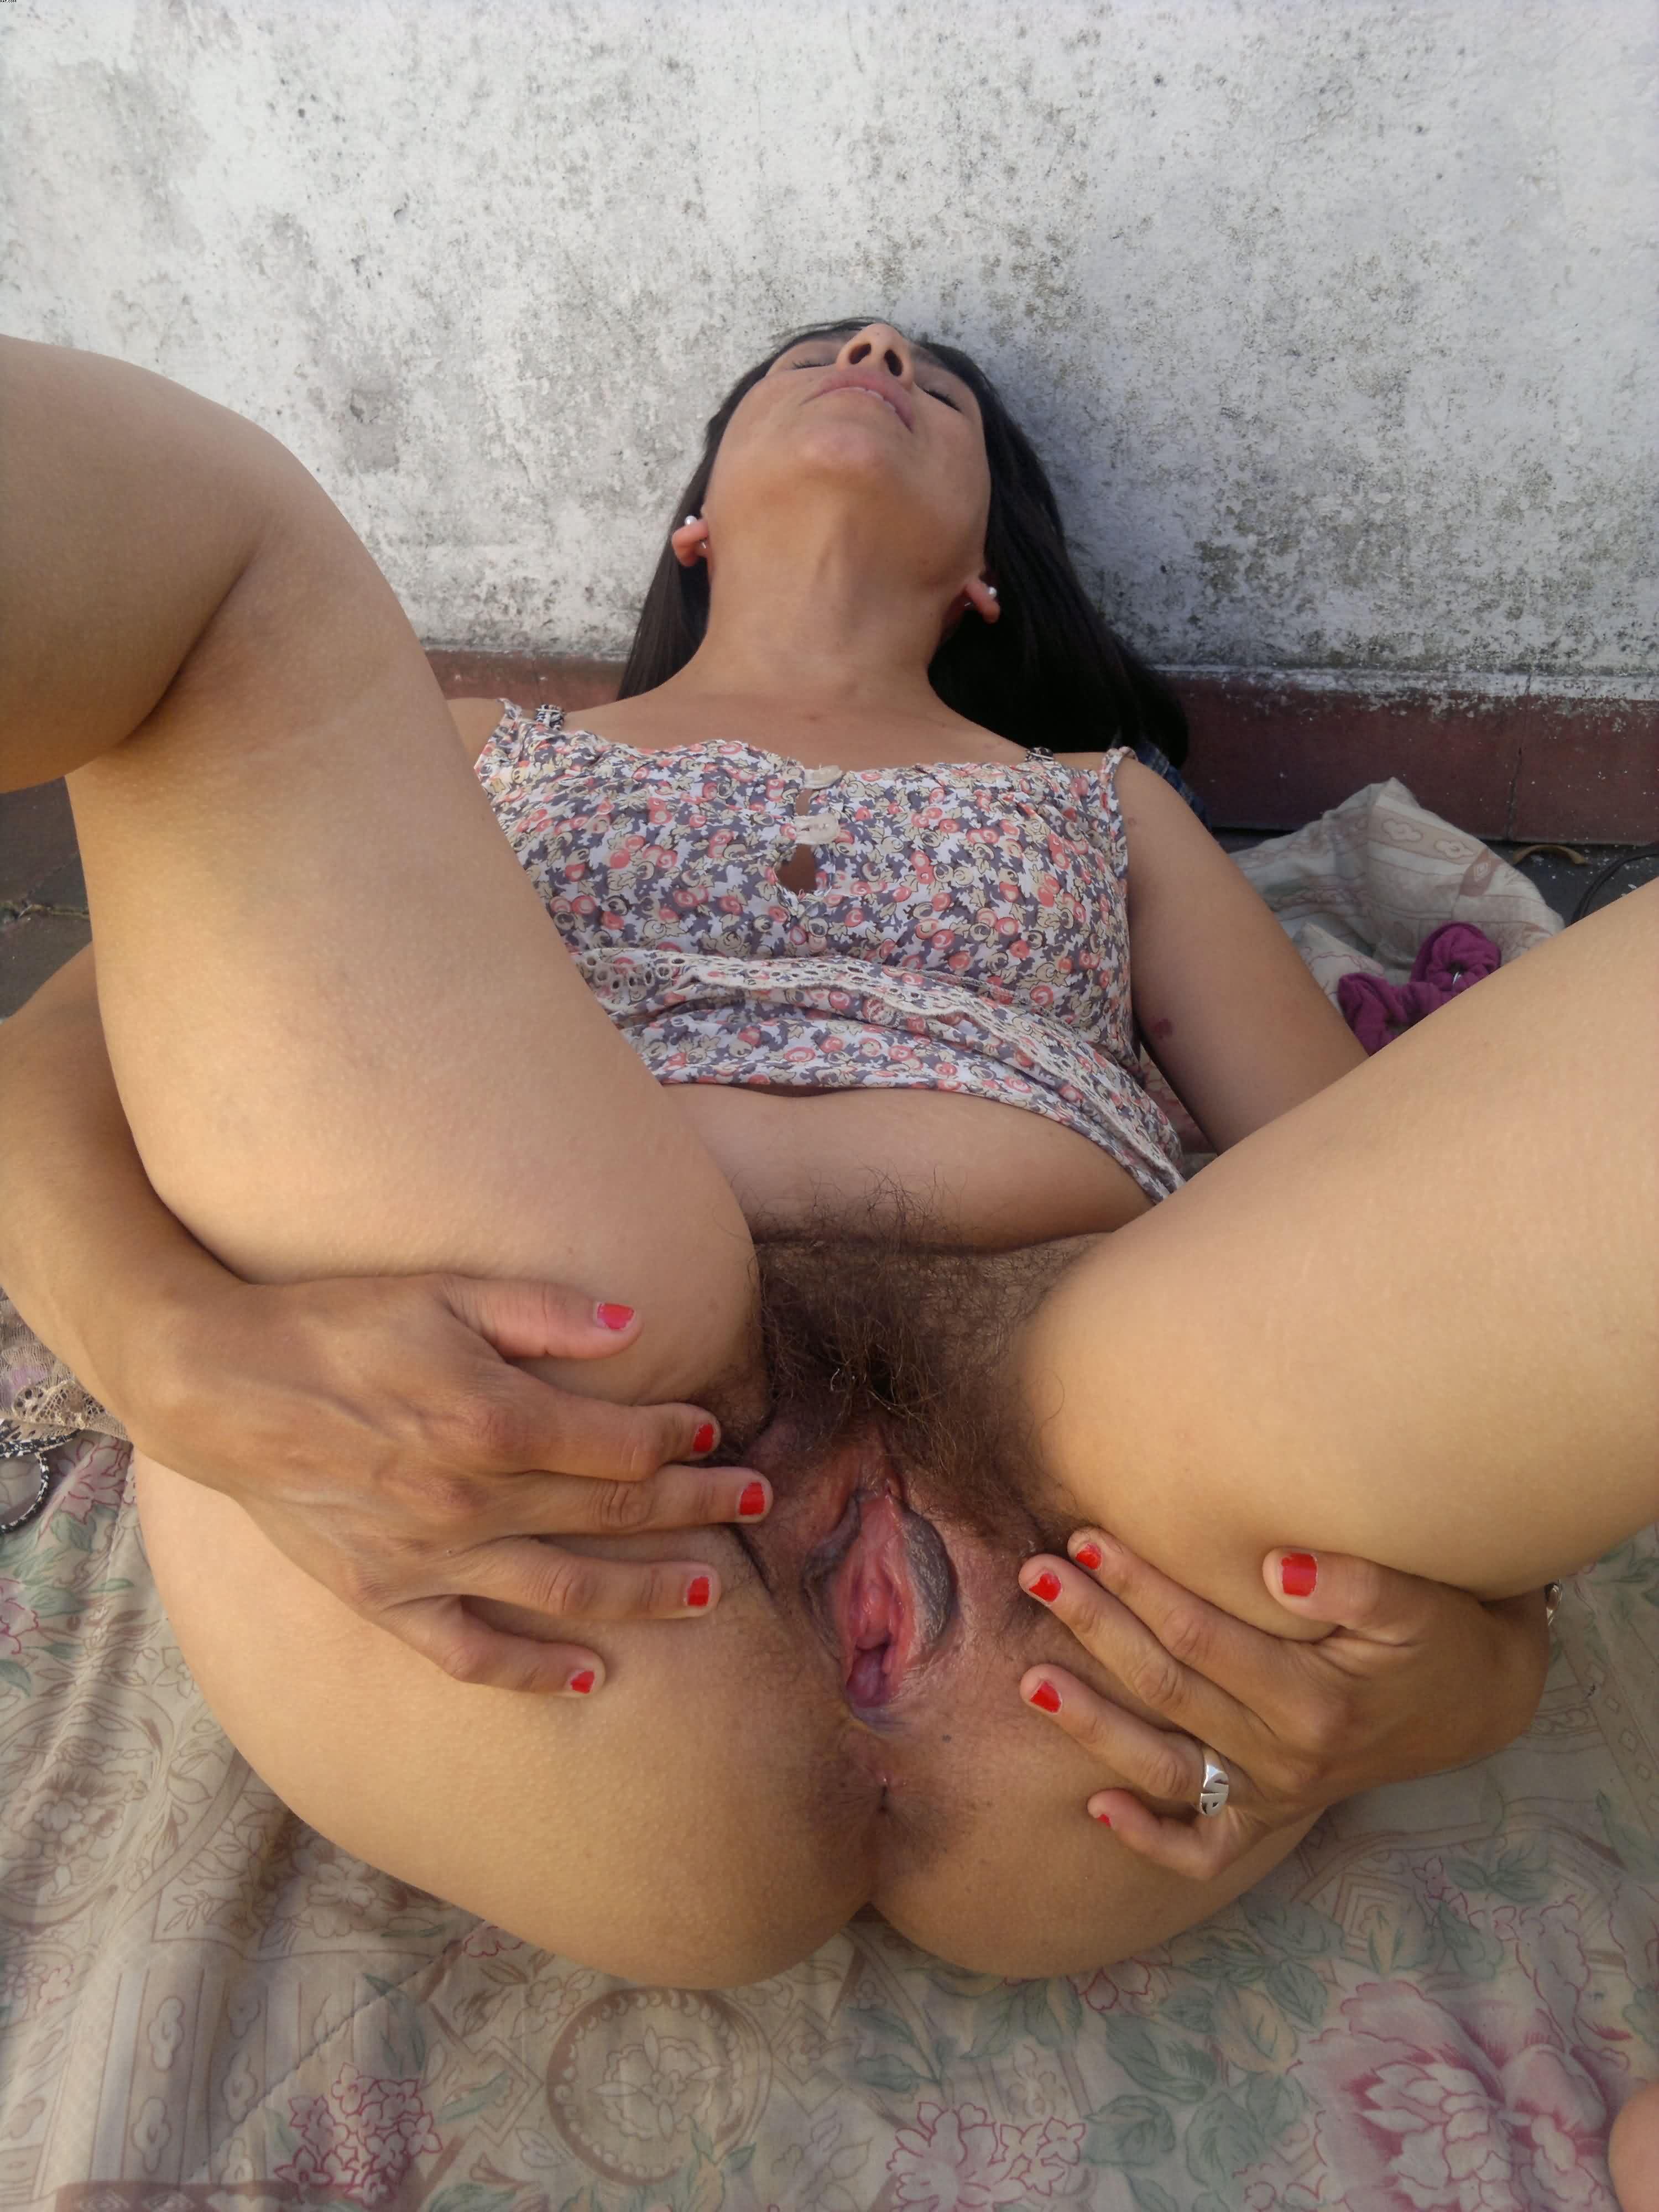 Desi milf pussy pics hd